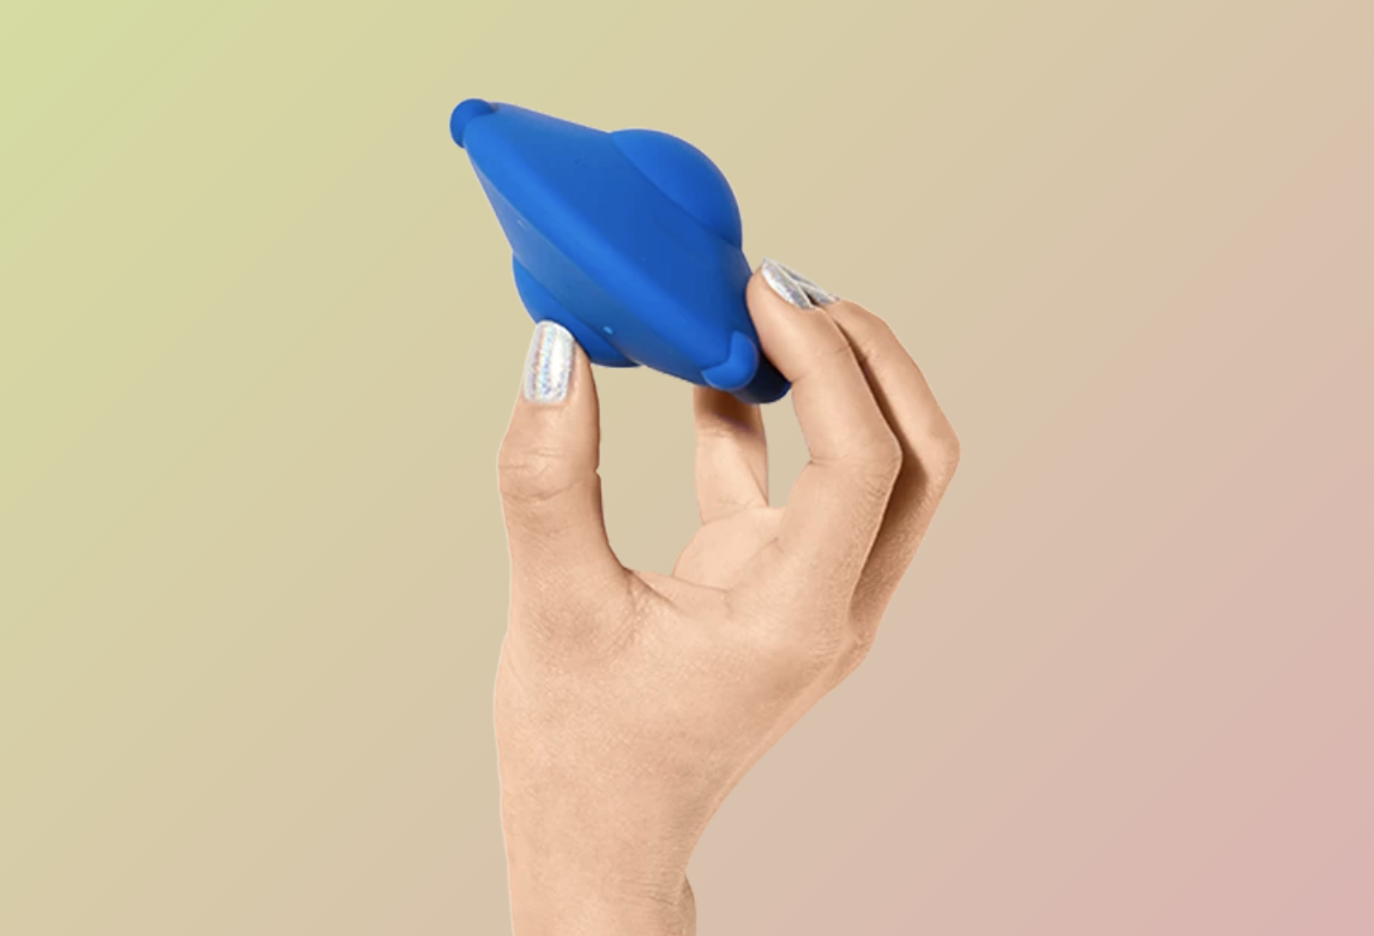 Hand holding UFO-shape vibrator